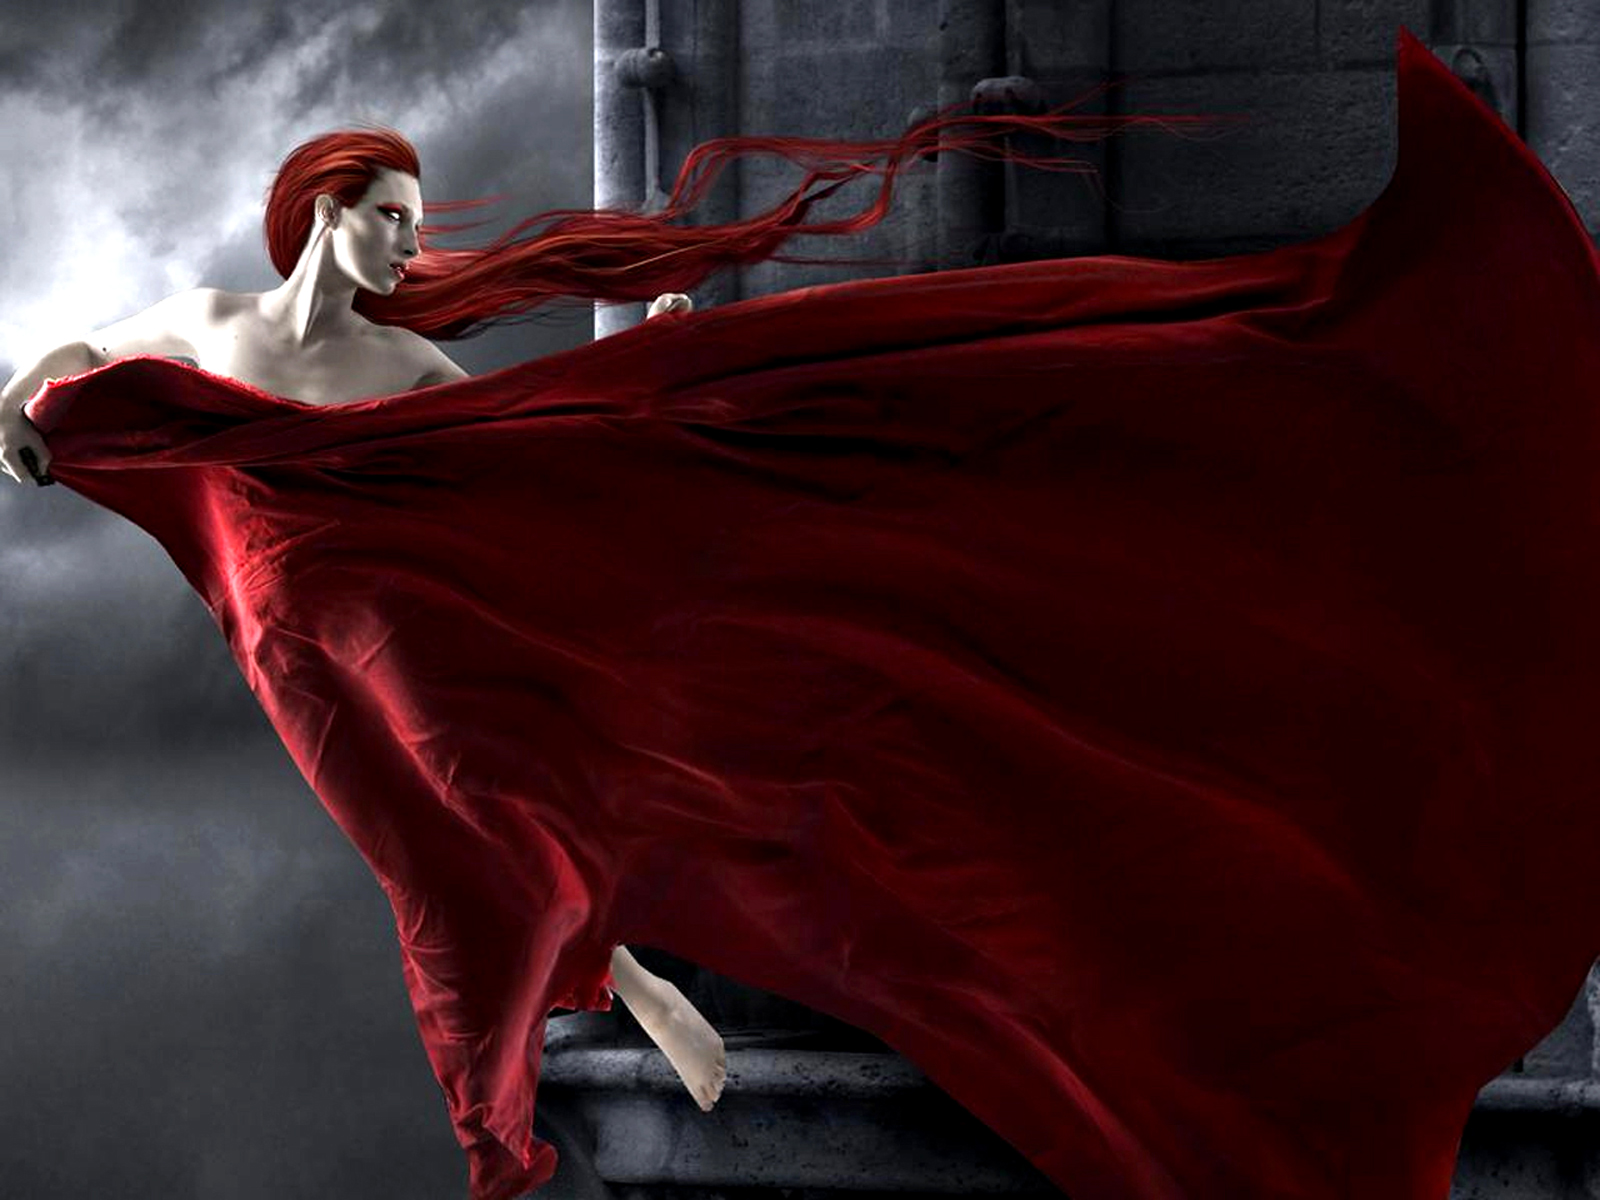 обои девушка, вамп, волосы, платье картинки фото